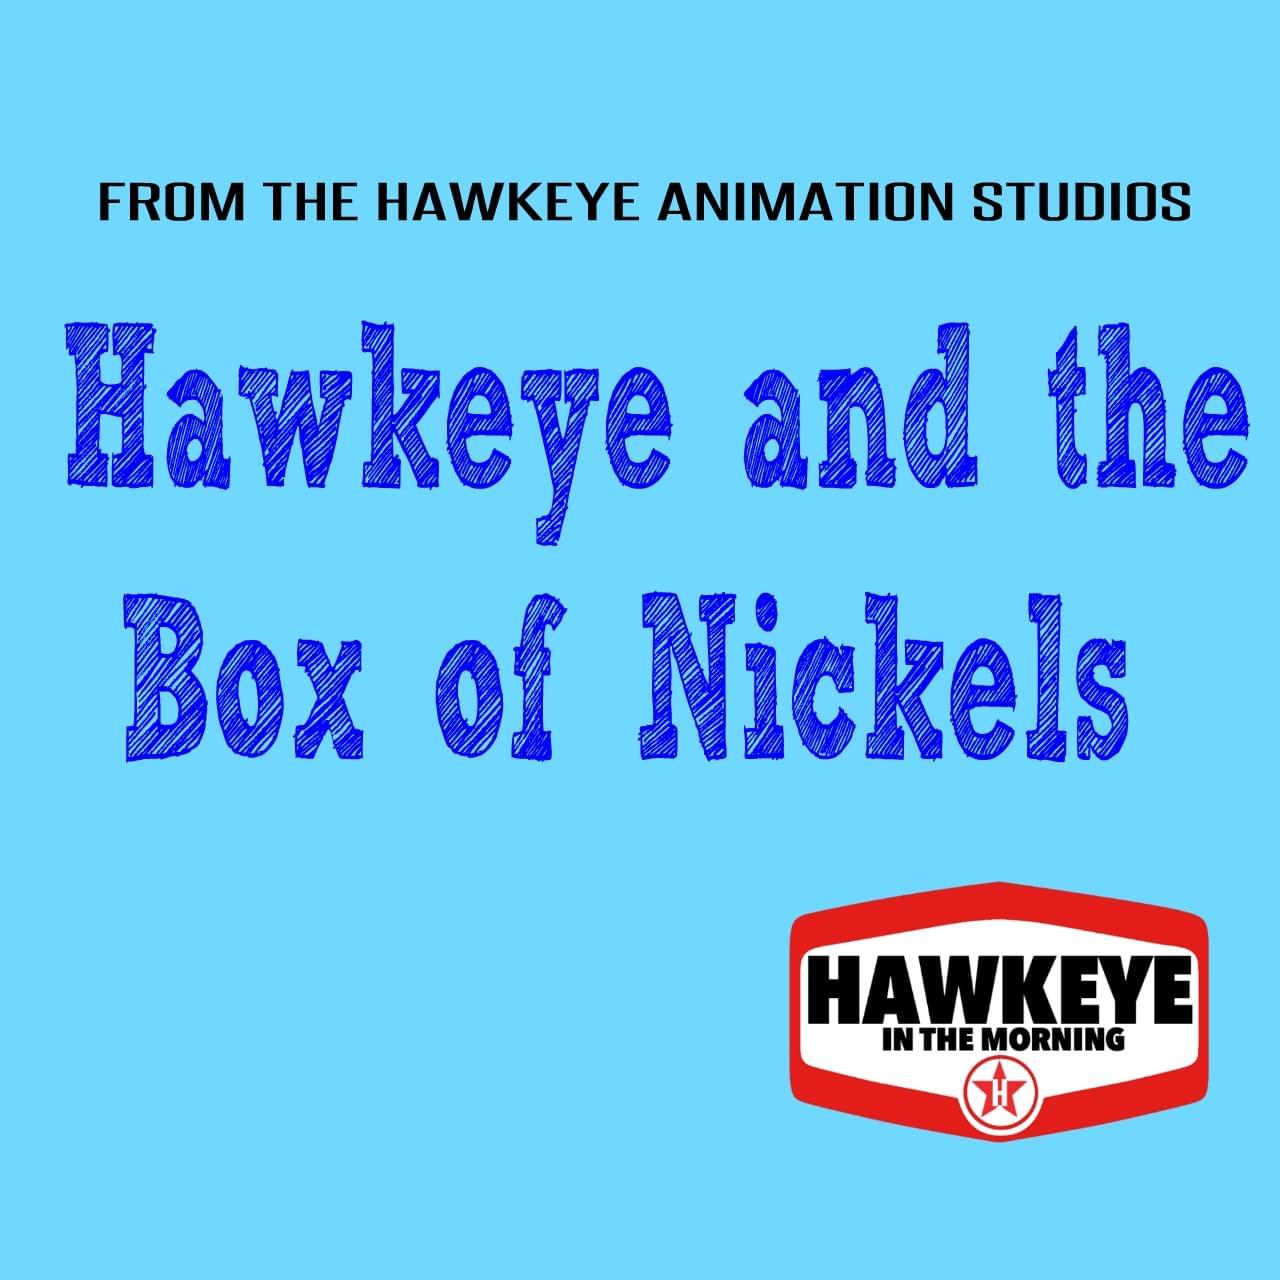 Box of Nickels